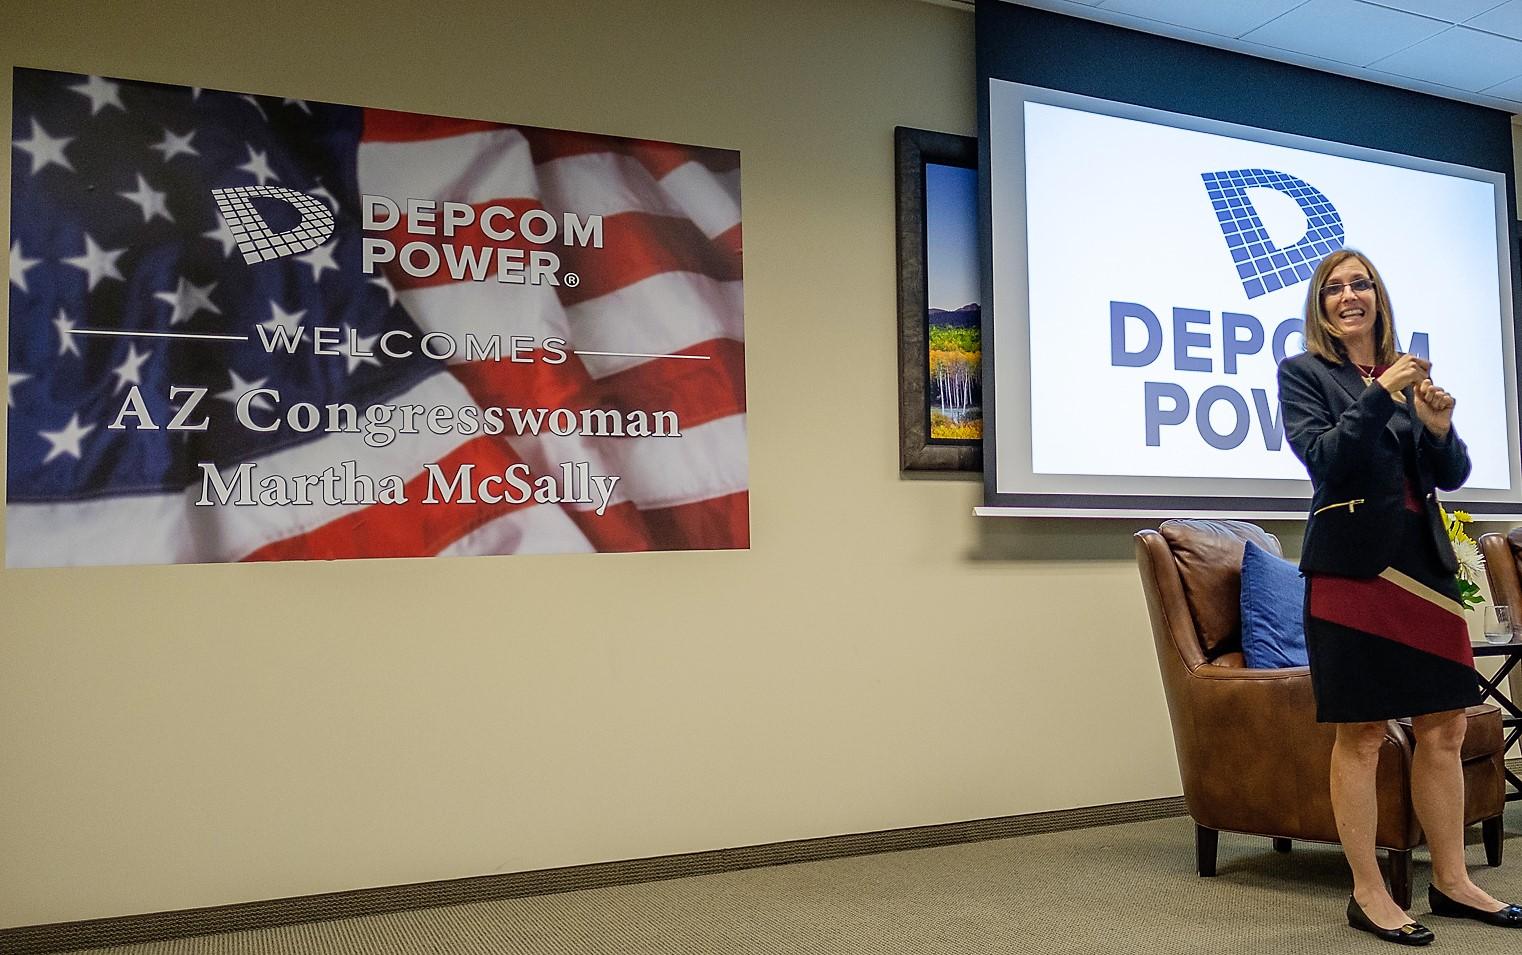 DEPCOM Team Members Talk U.S. Solar Legislation with AZ Congresswoman Martha McSally